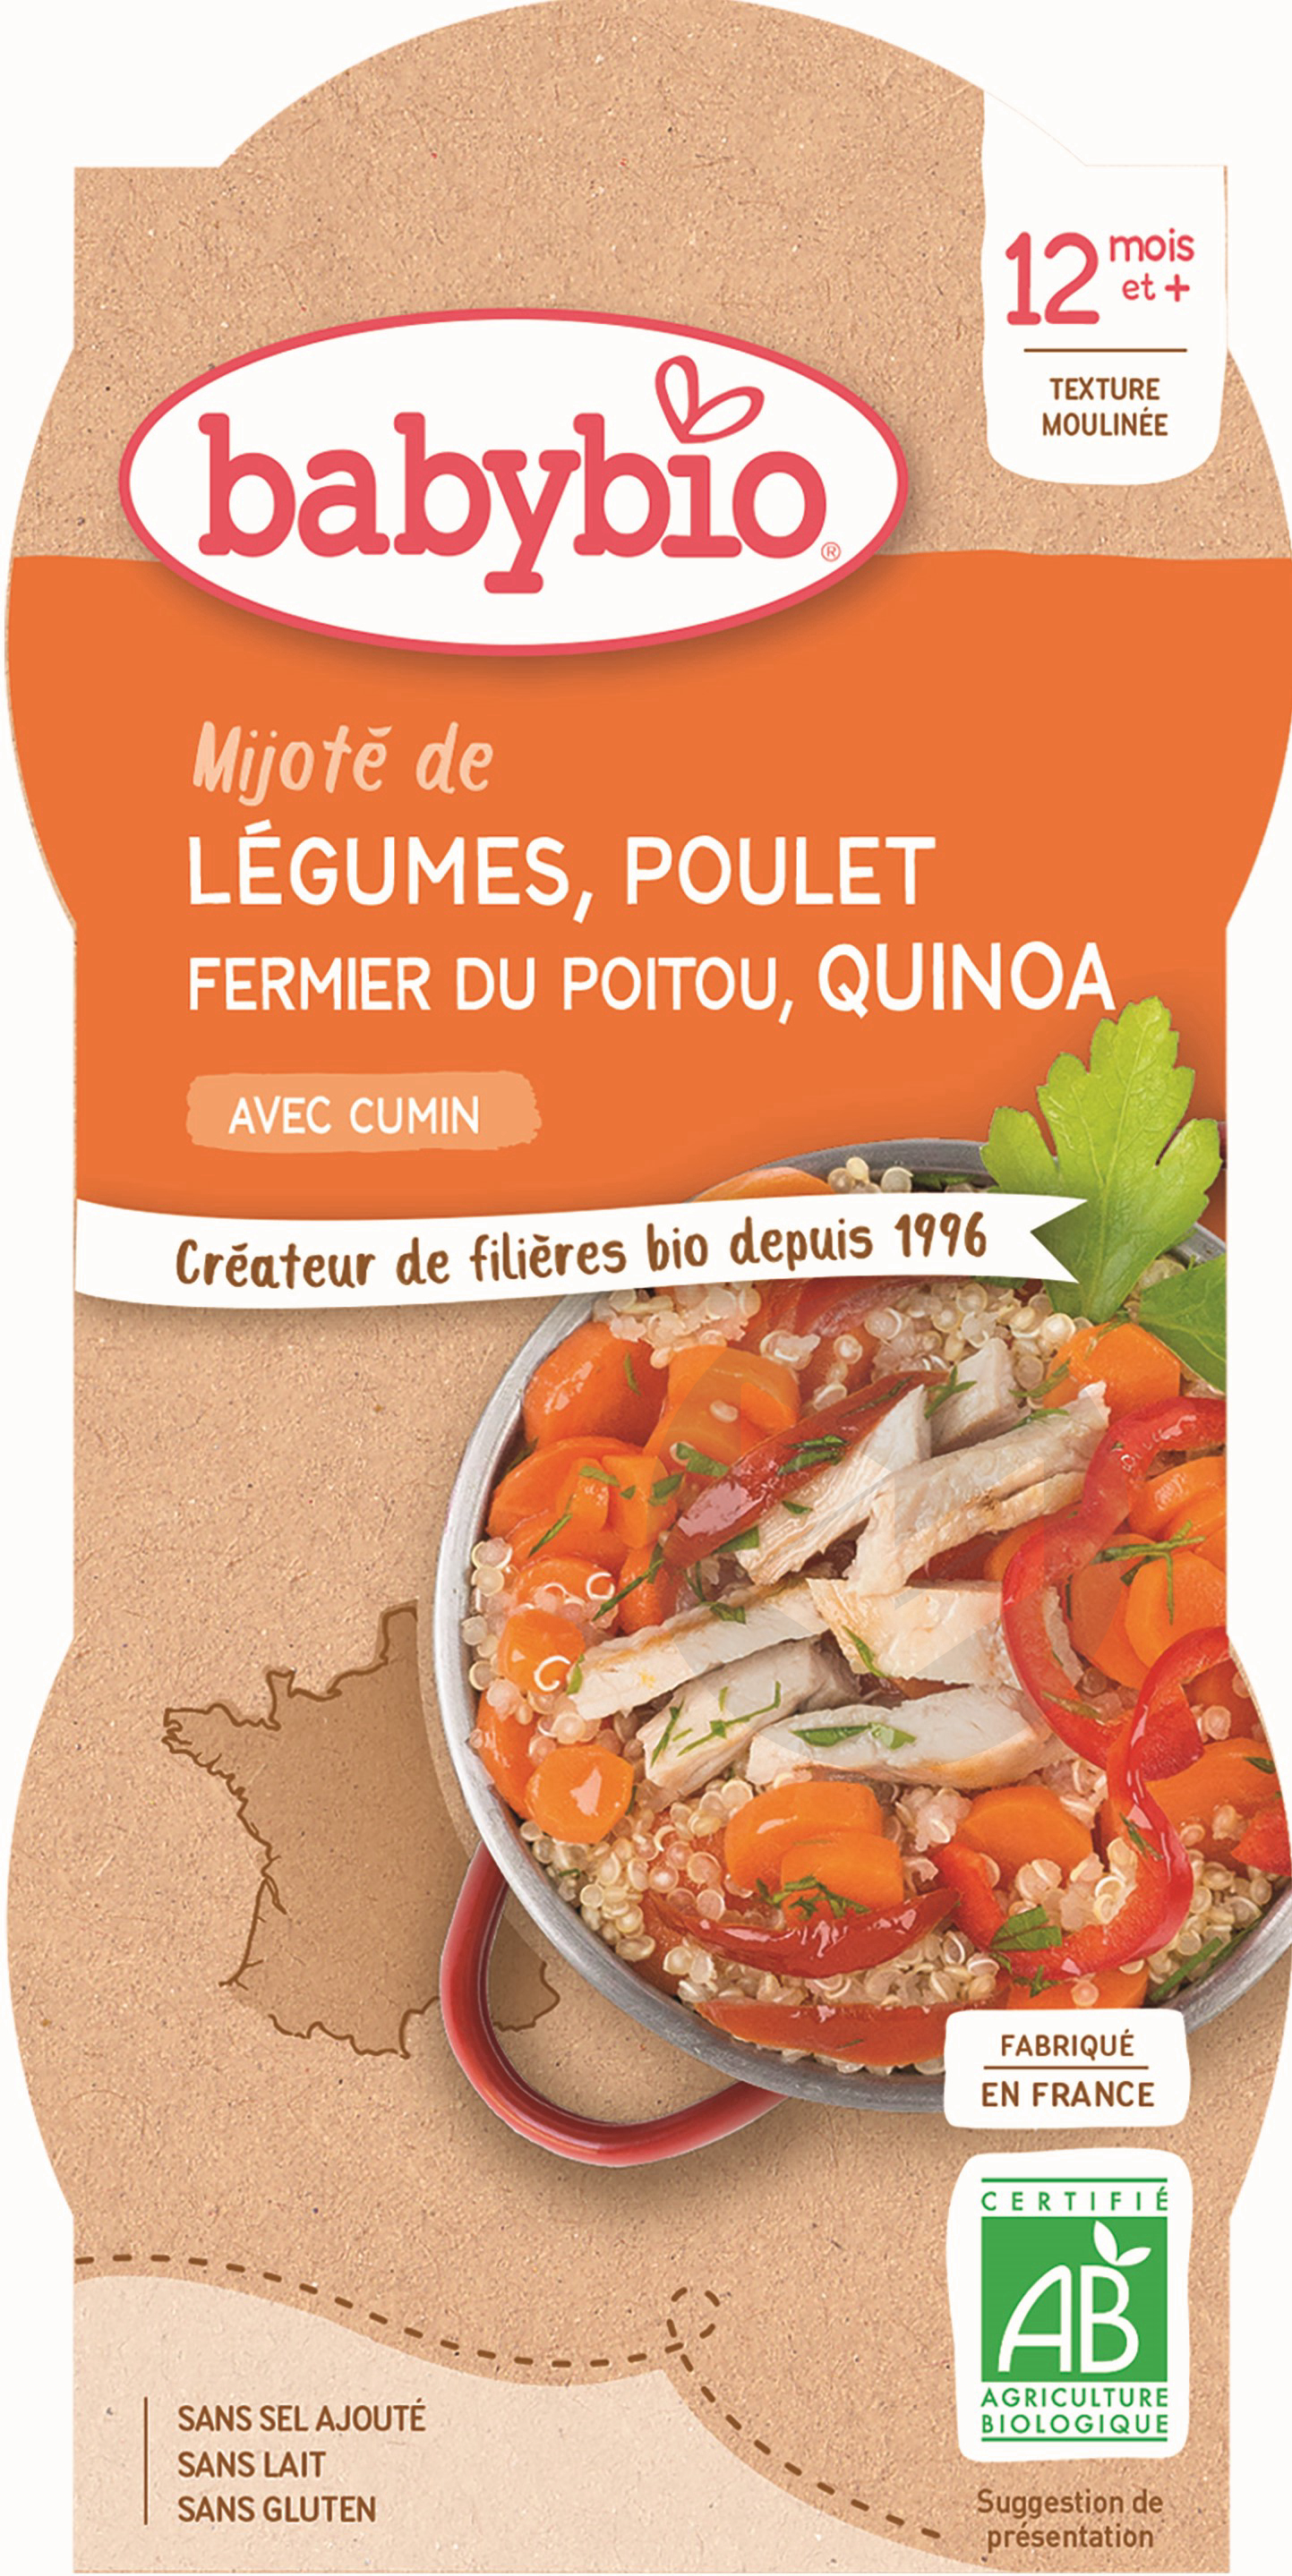 BABYBIO Bol Légumes Poulet Quinoa